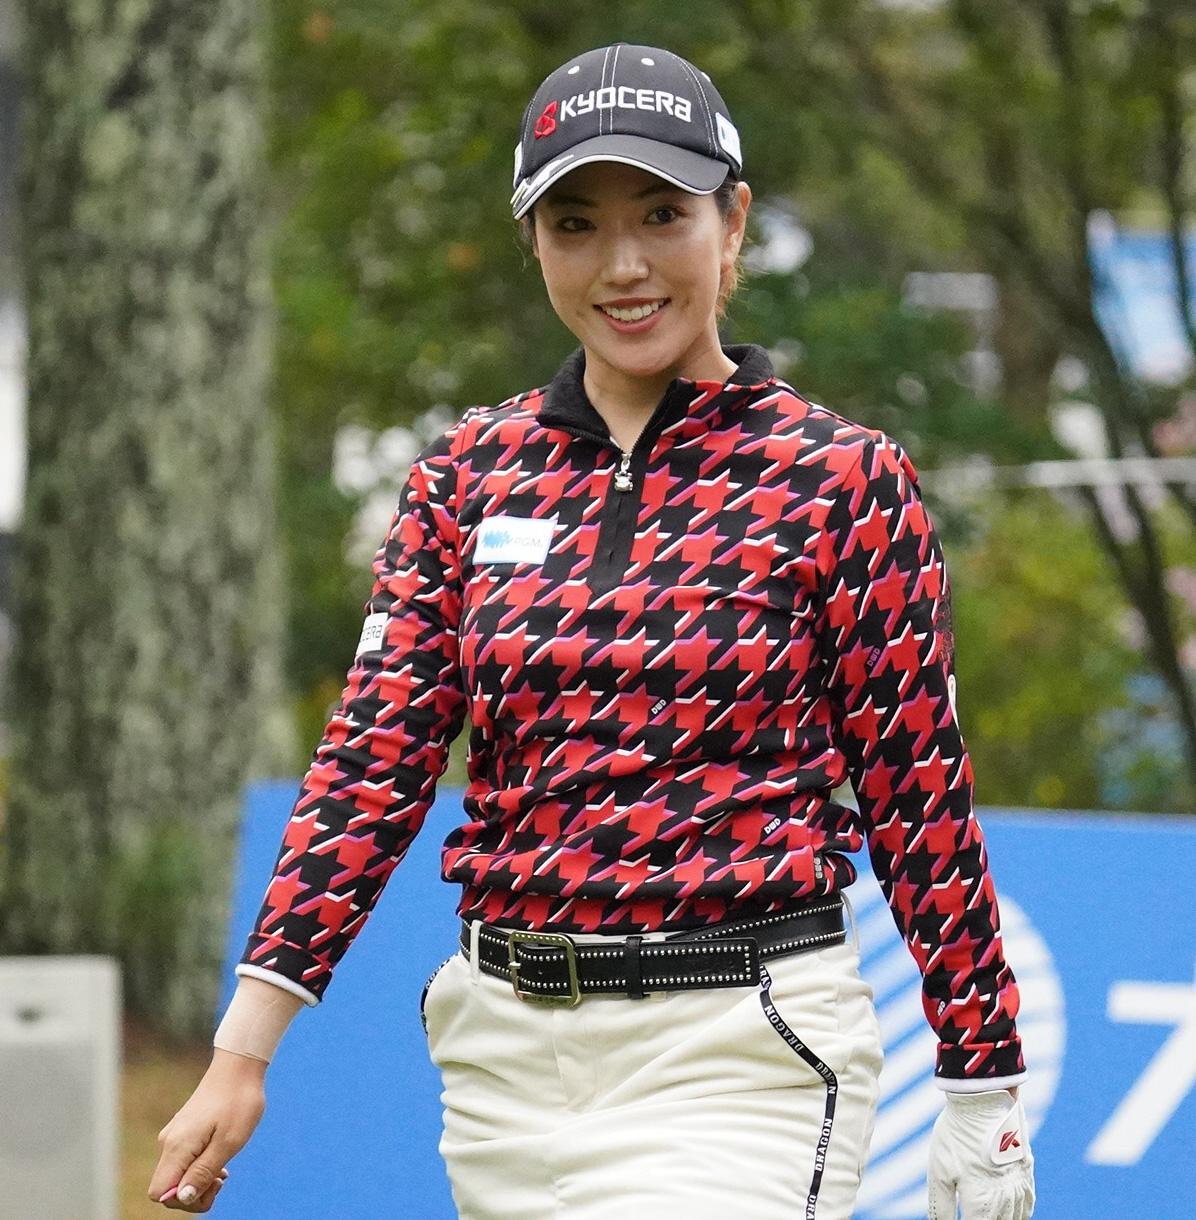 https://www.nikkansports.com/sports/golf/news/img/202011200000061-w1300_6.jpg